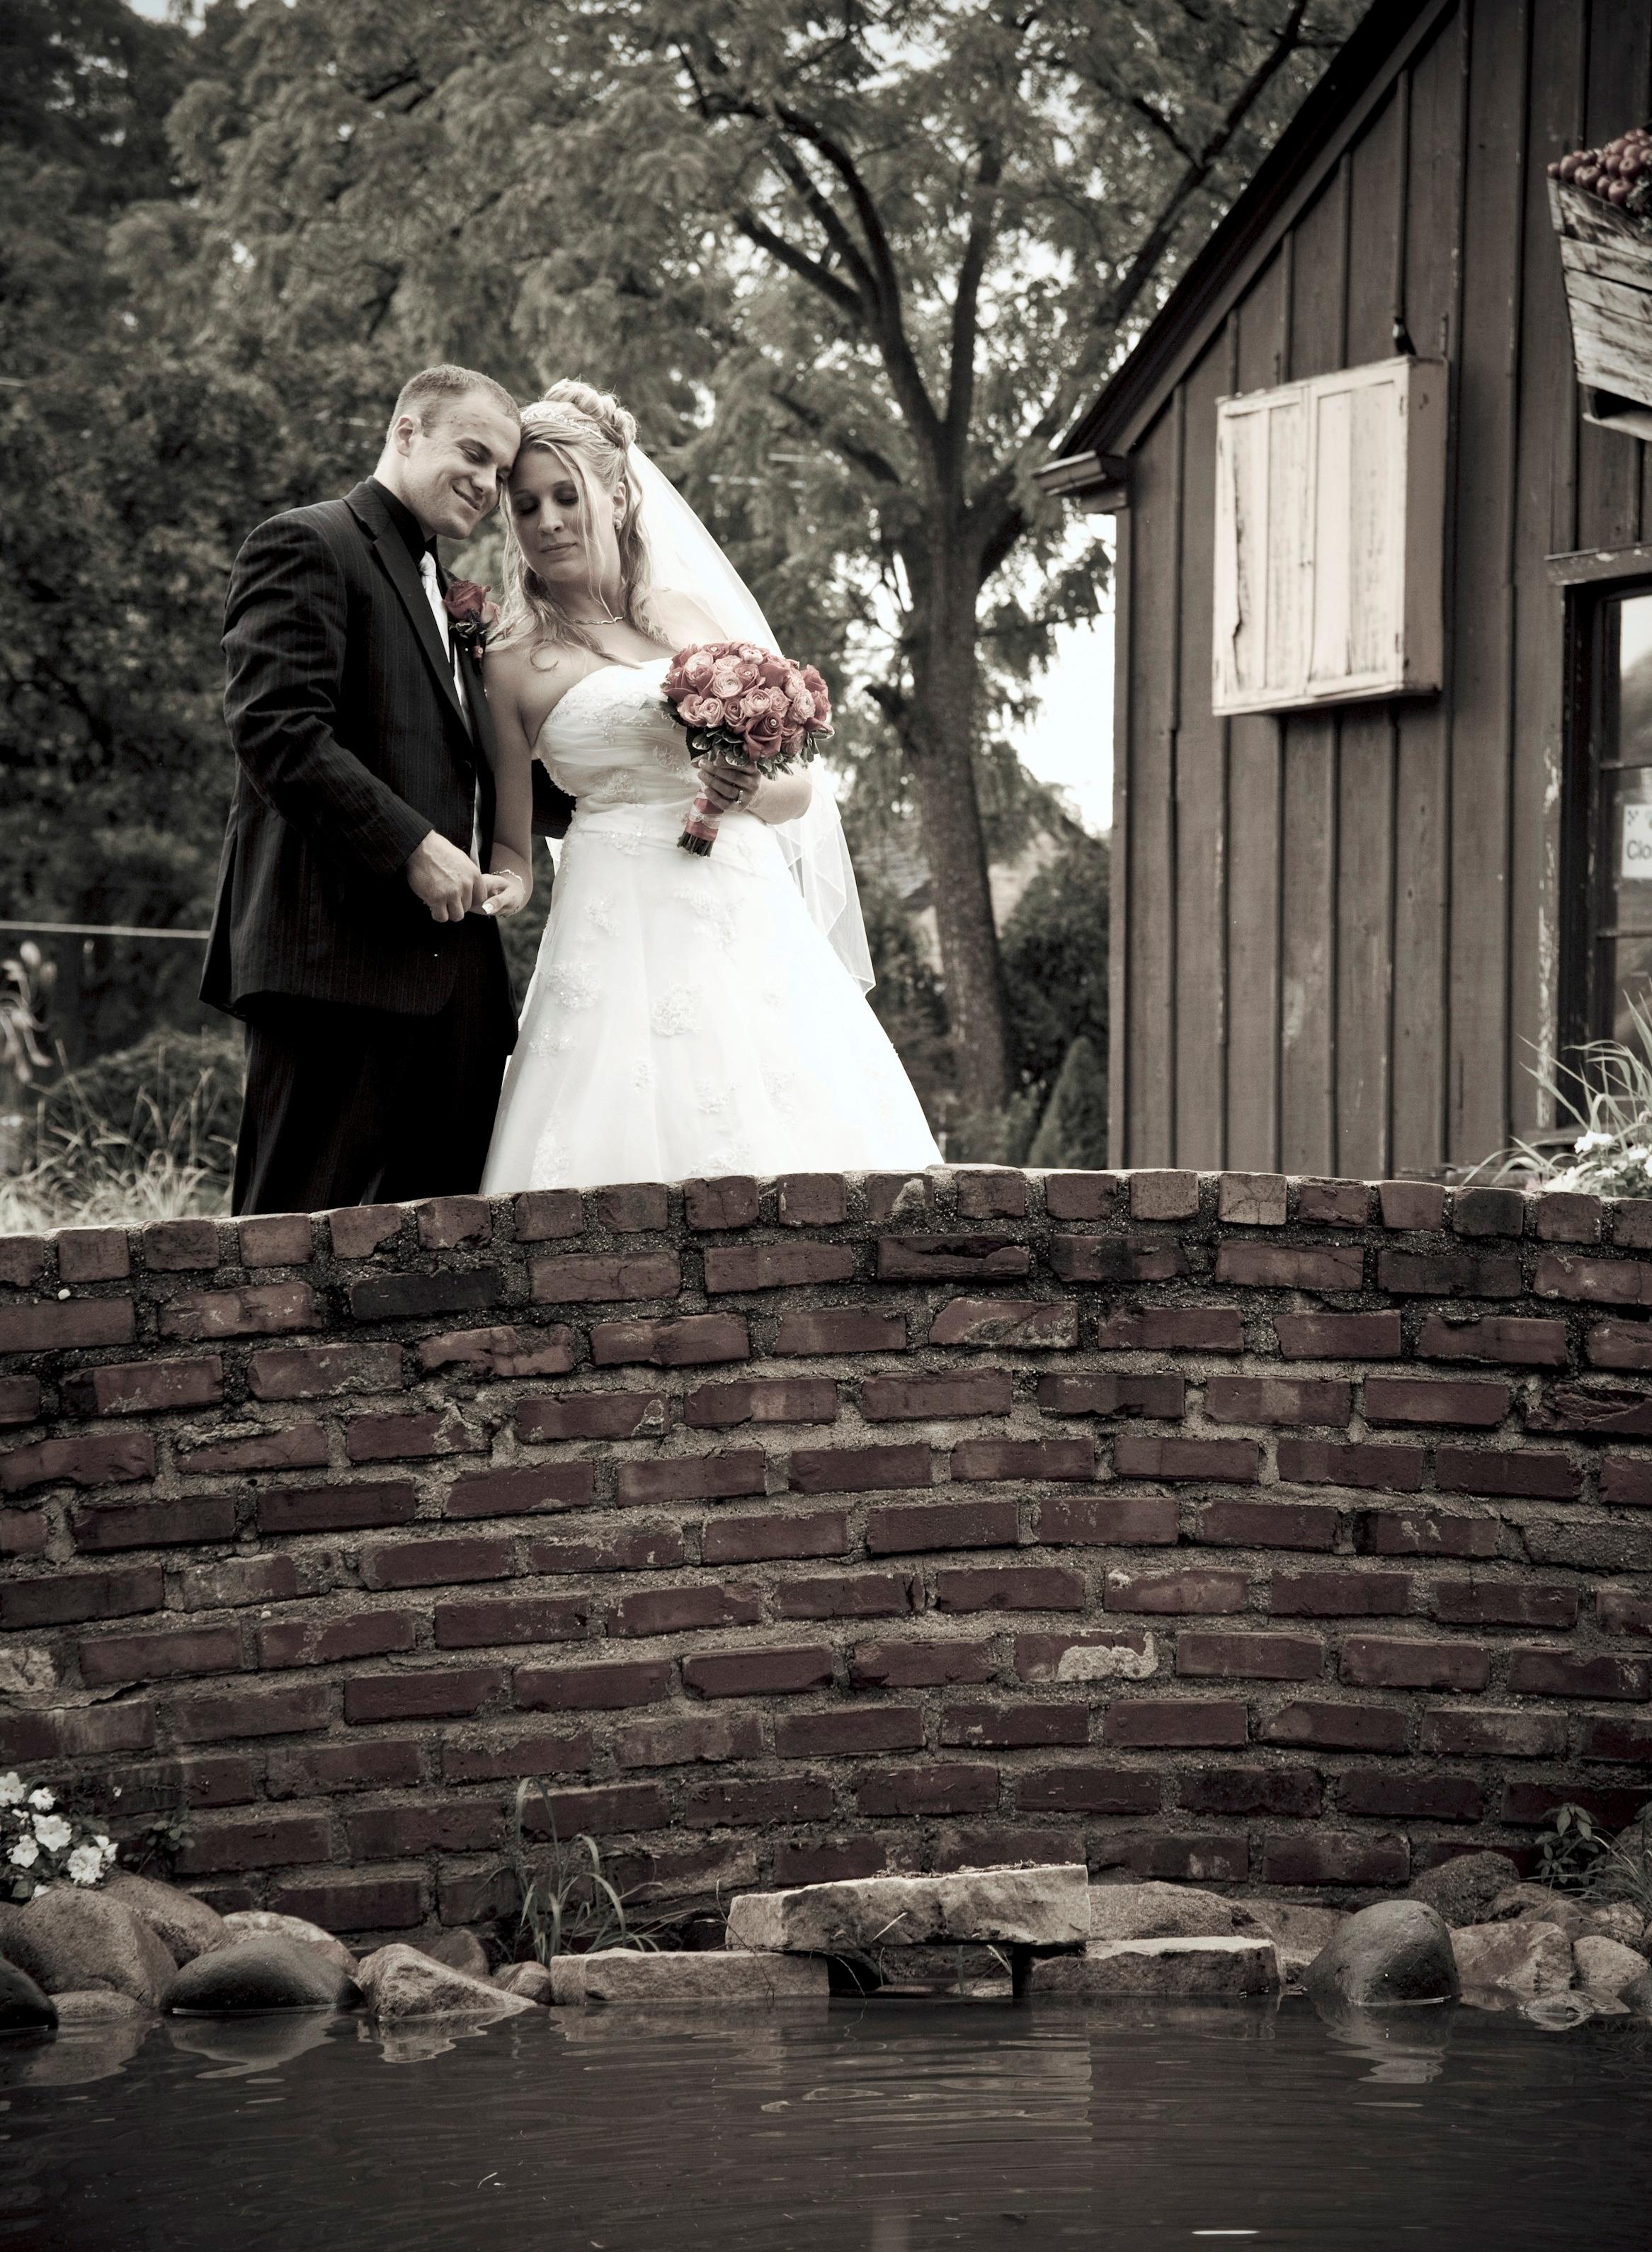 Wedding-Studio-Schaumburg-Illinois-x4.jpg